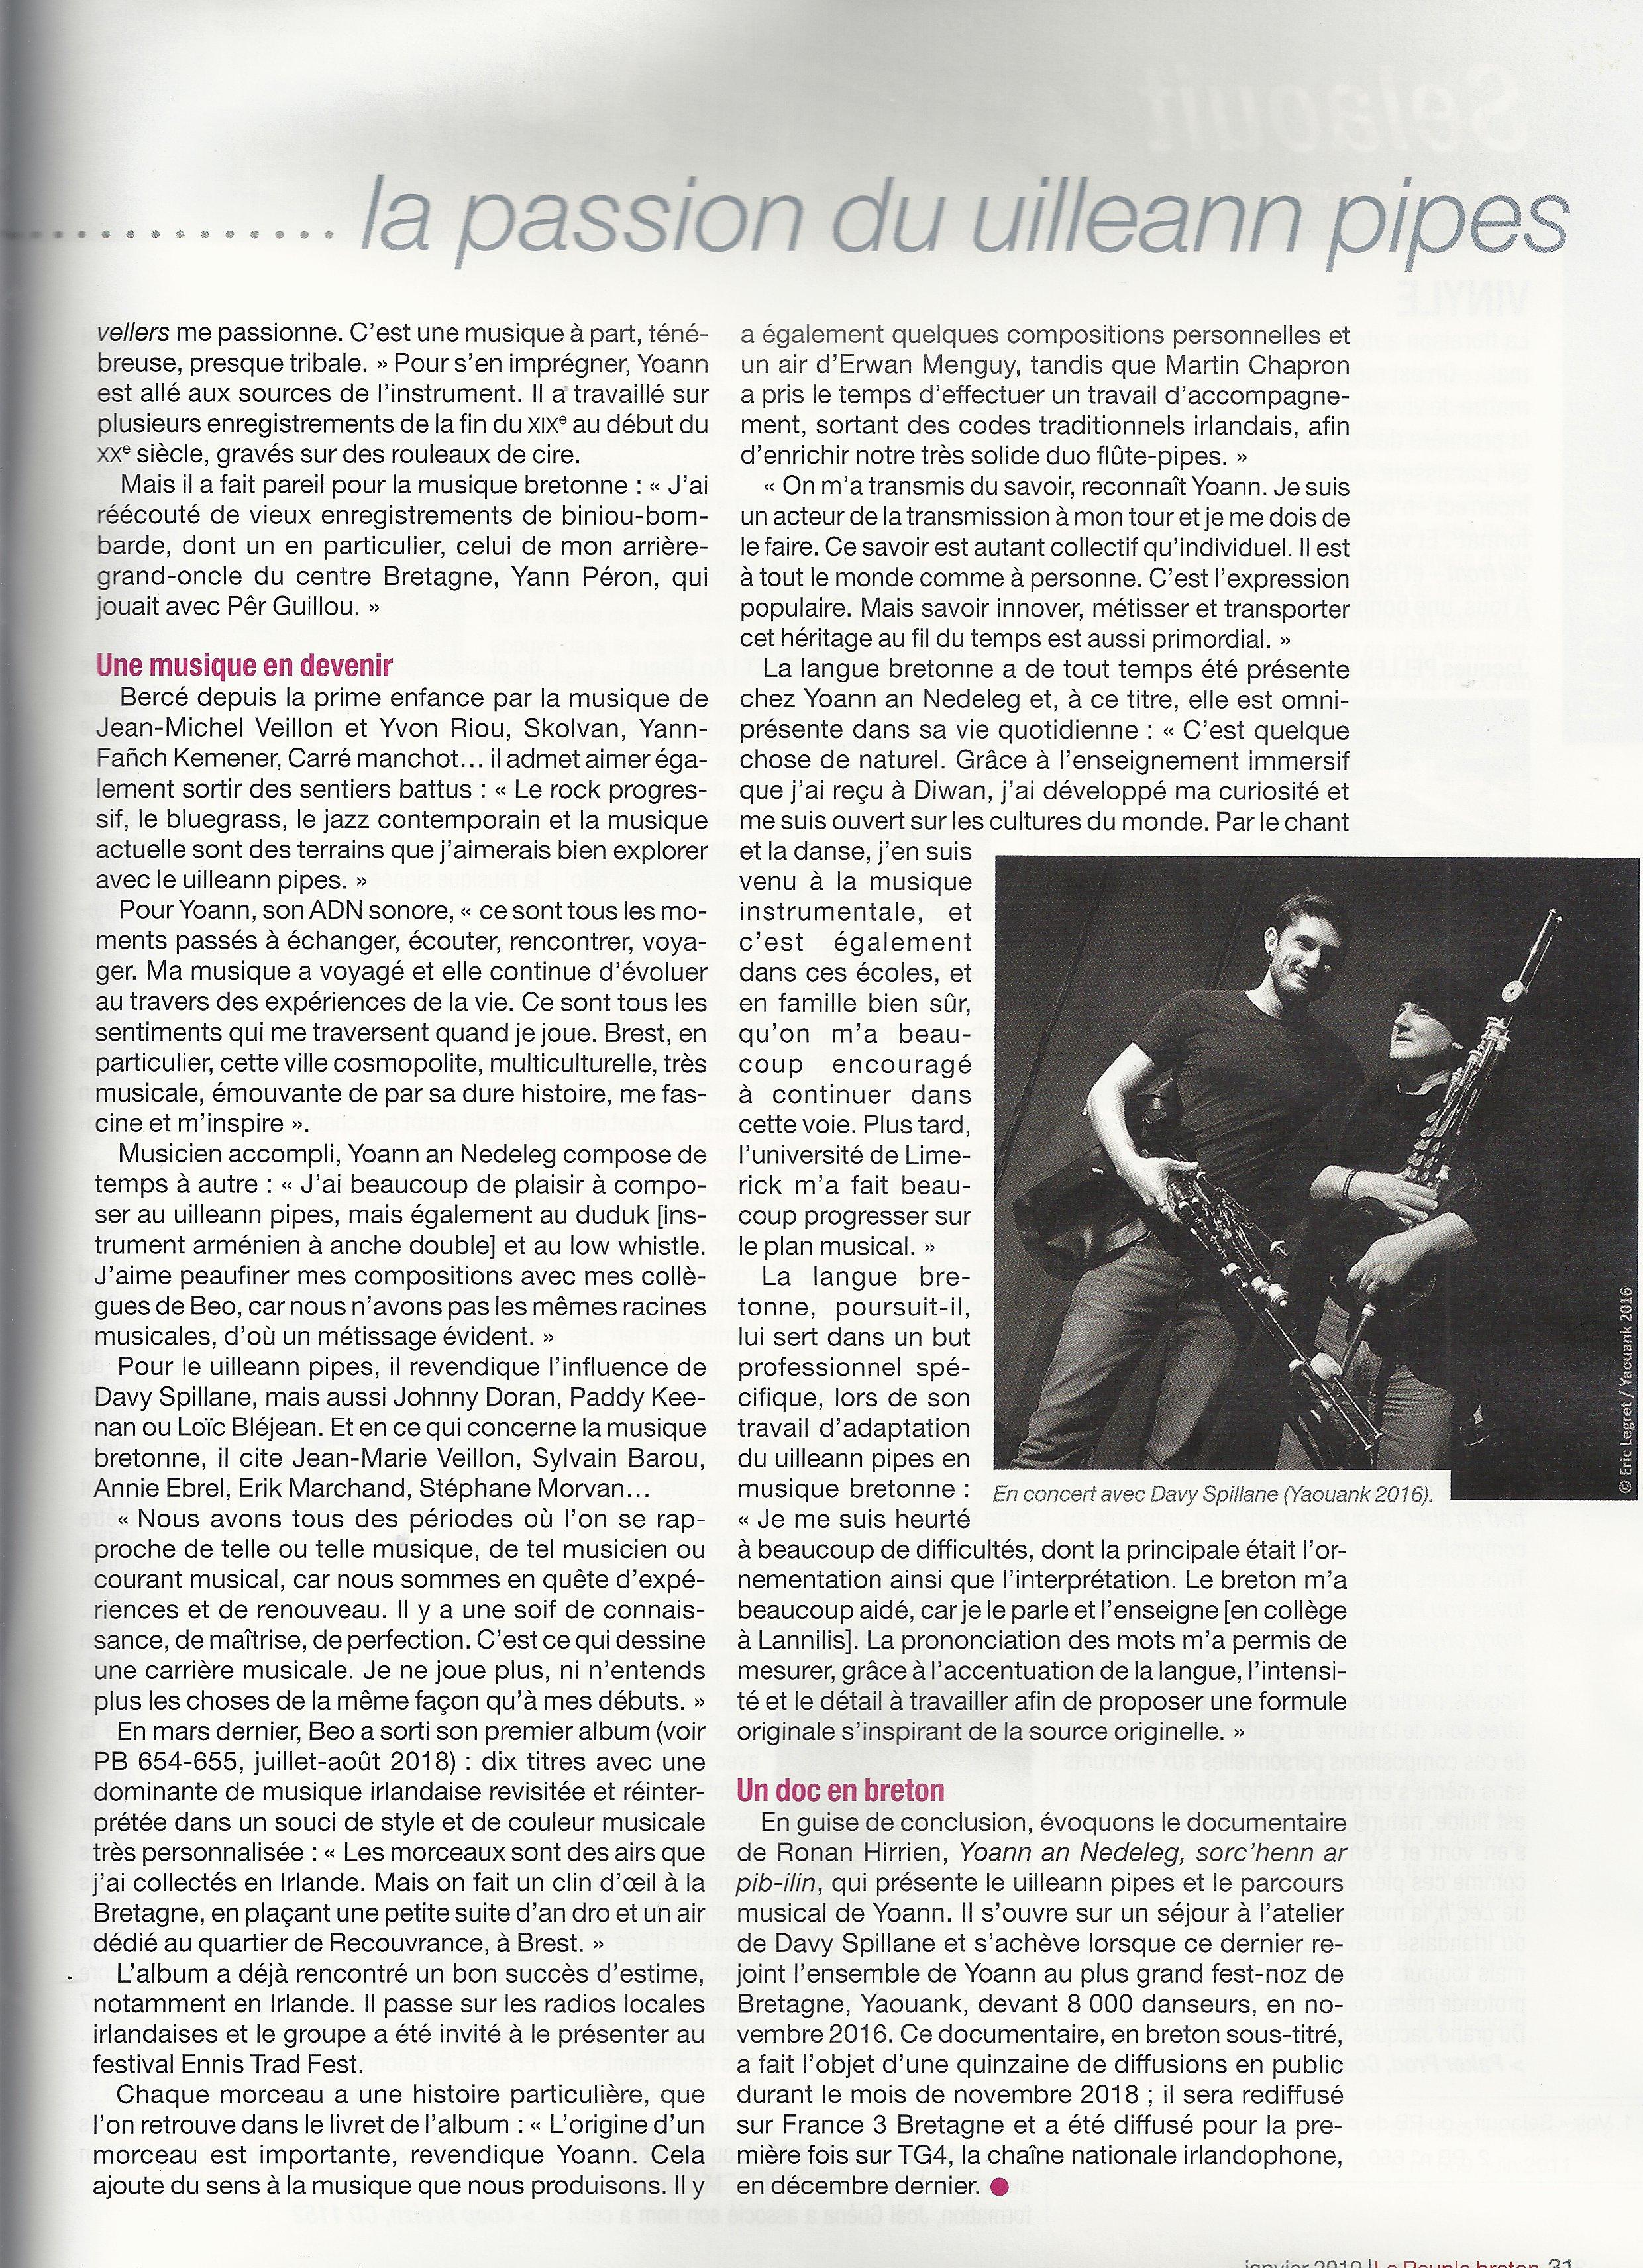 Article Pobl Vreizh (Janvier 2019)